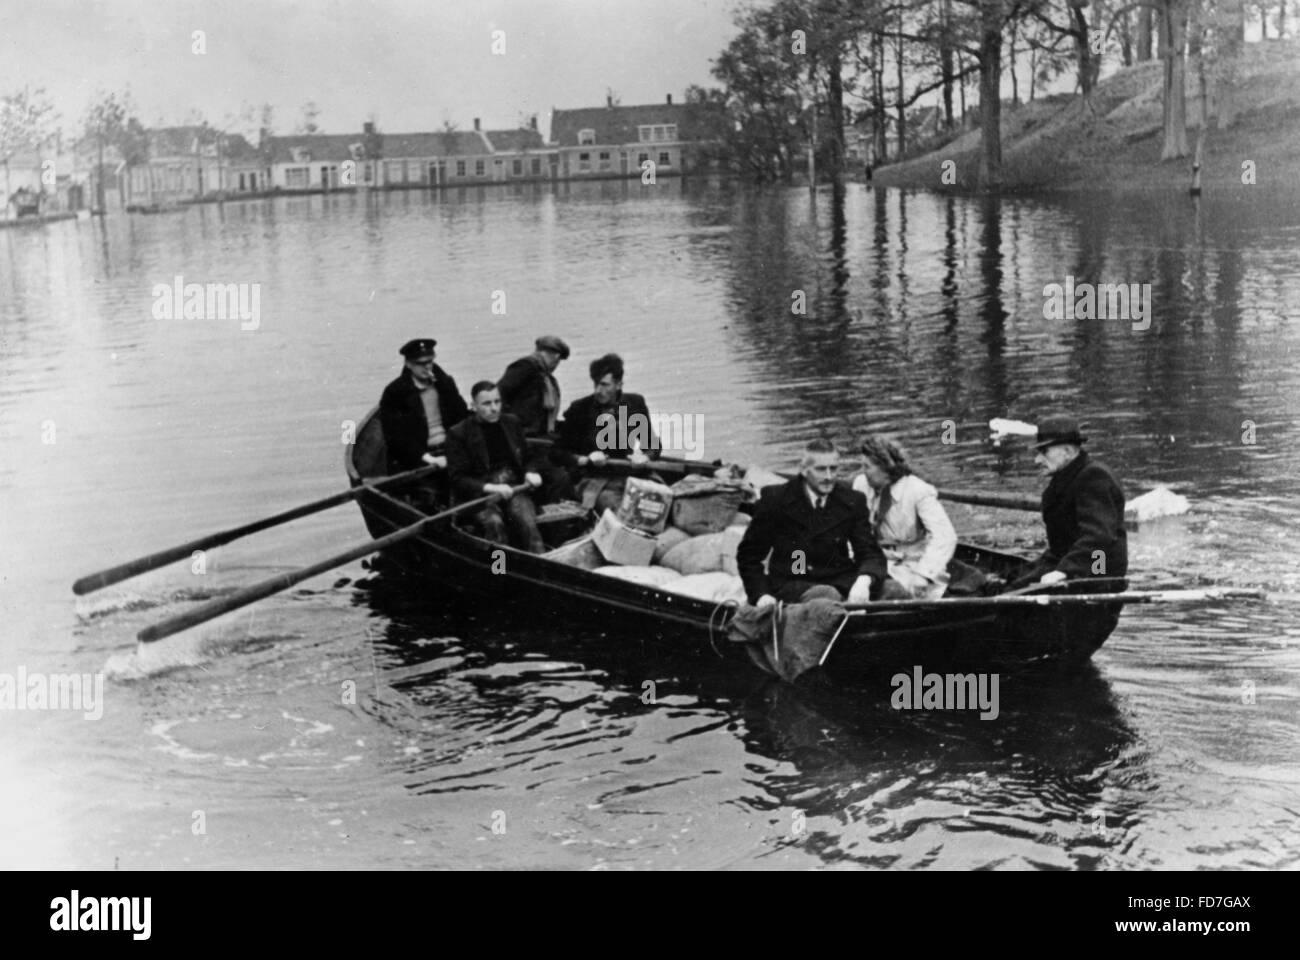 Dutch civilians flee from the island Walcheren, 1944 - Stock Image